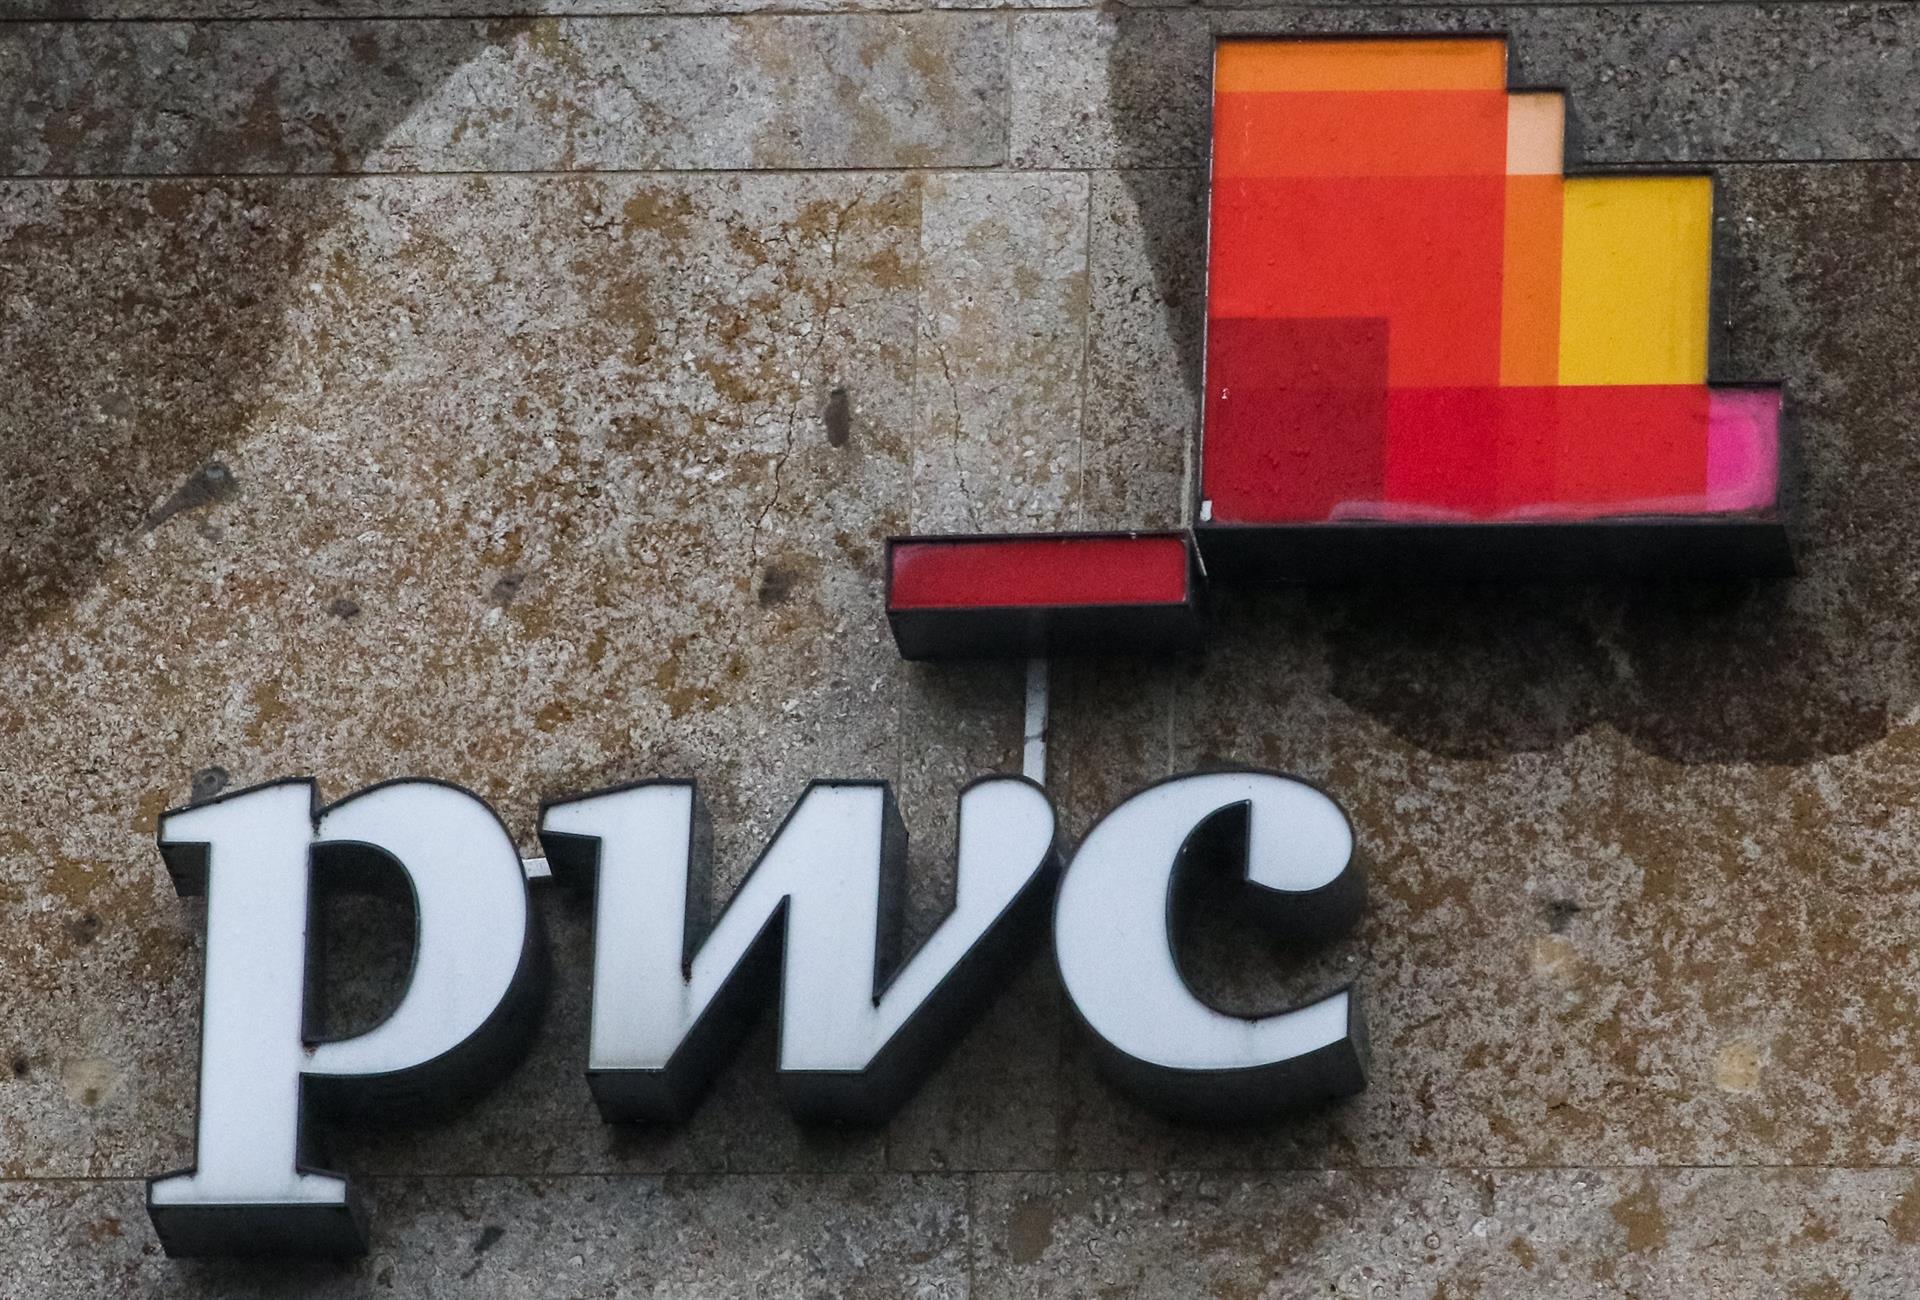 Logo de la compañía PricewaterhouseCoopers (PwC). EFE/EPA/FOCKE STRANGMANN/Archivo